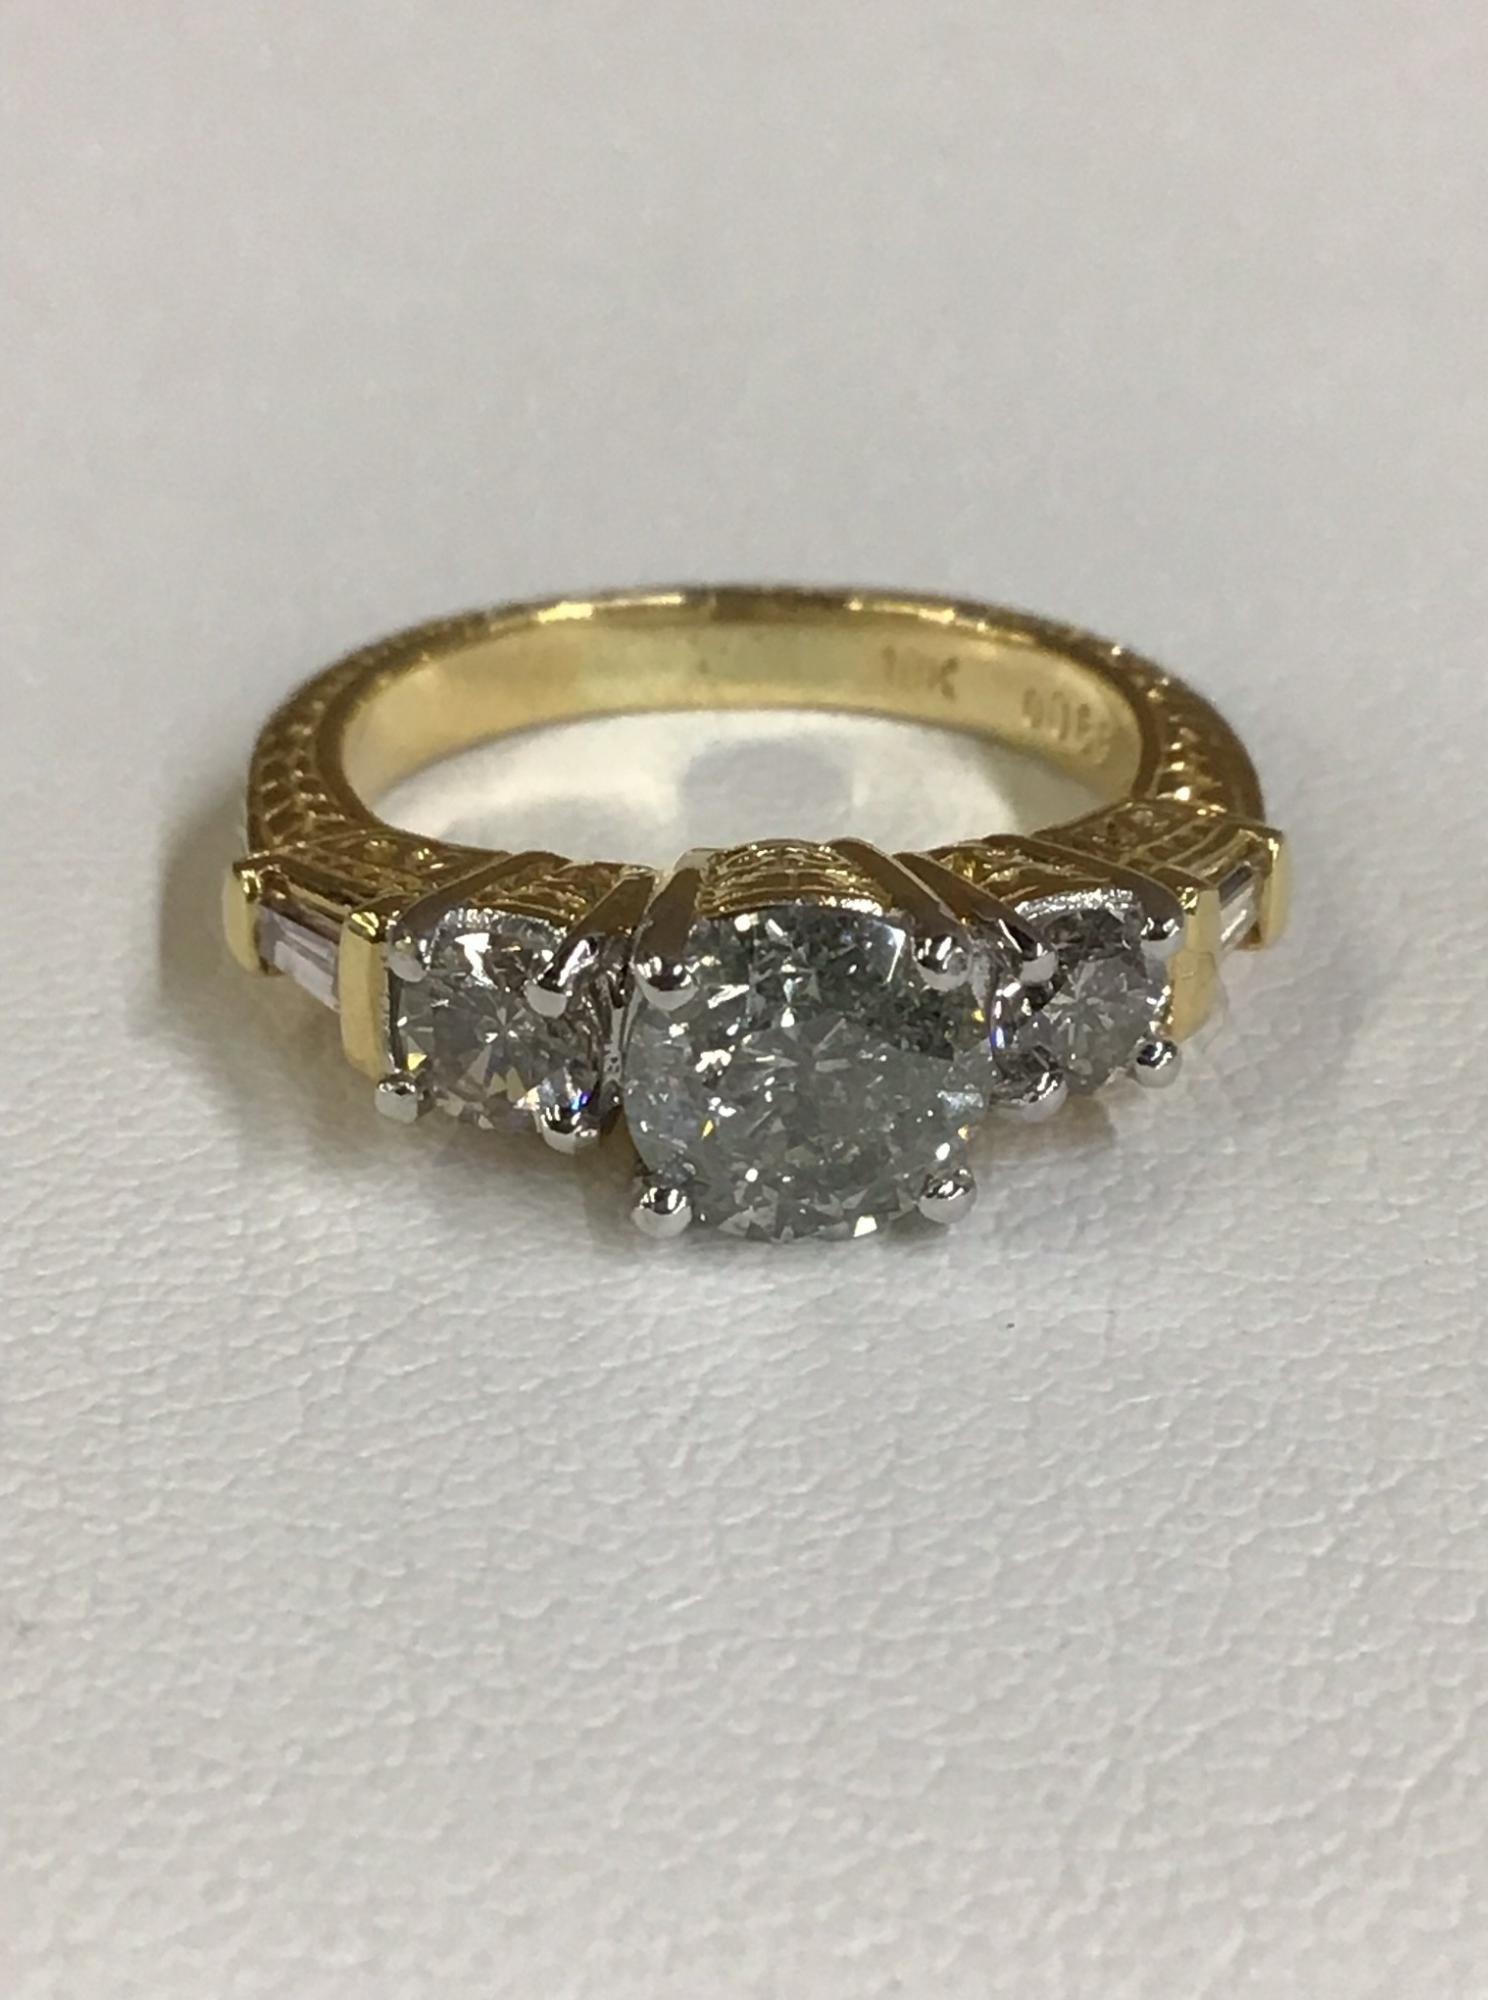 18K Yellow Gold Diamond Ring Approximately 1.7 TCW